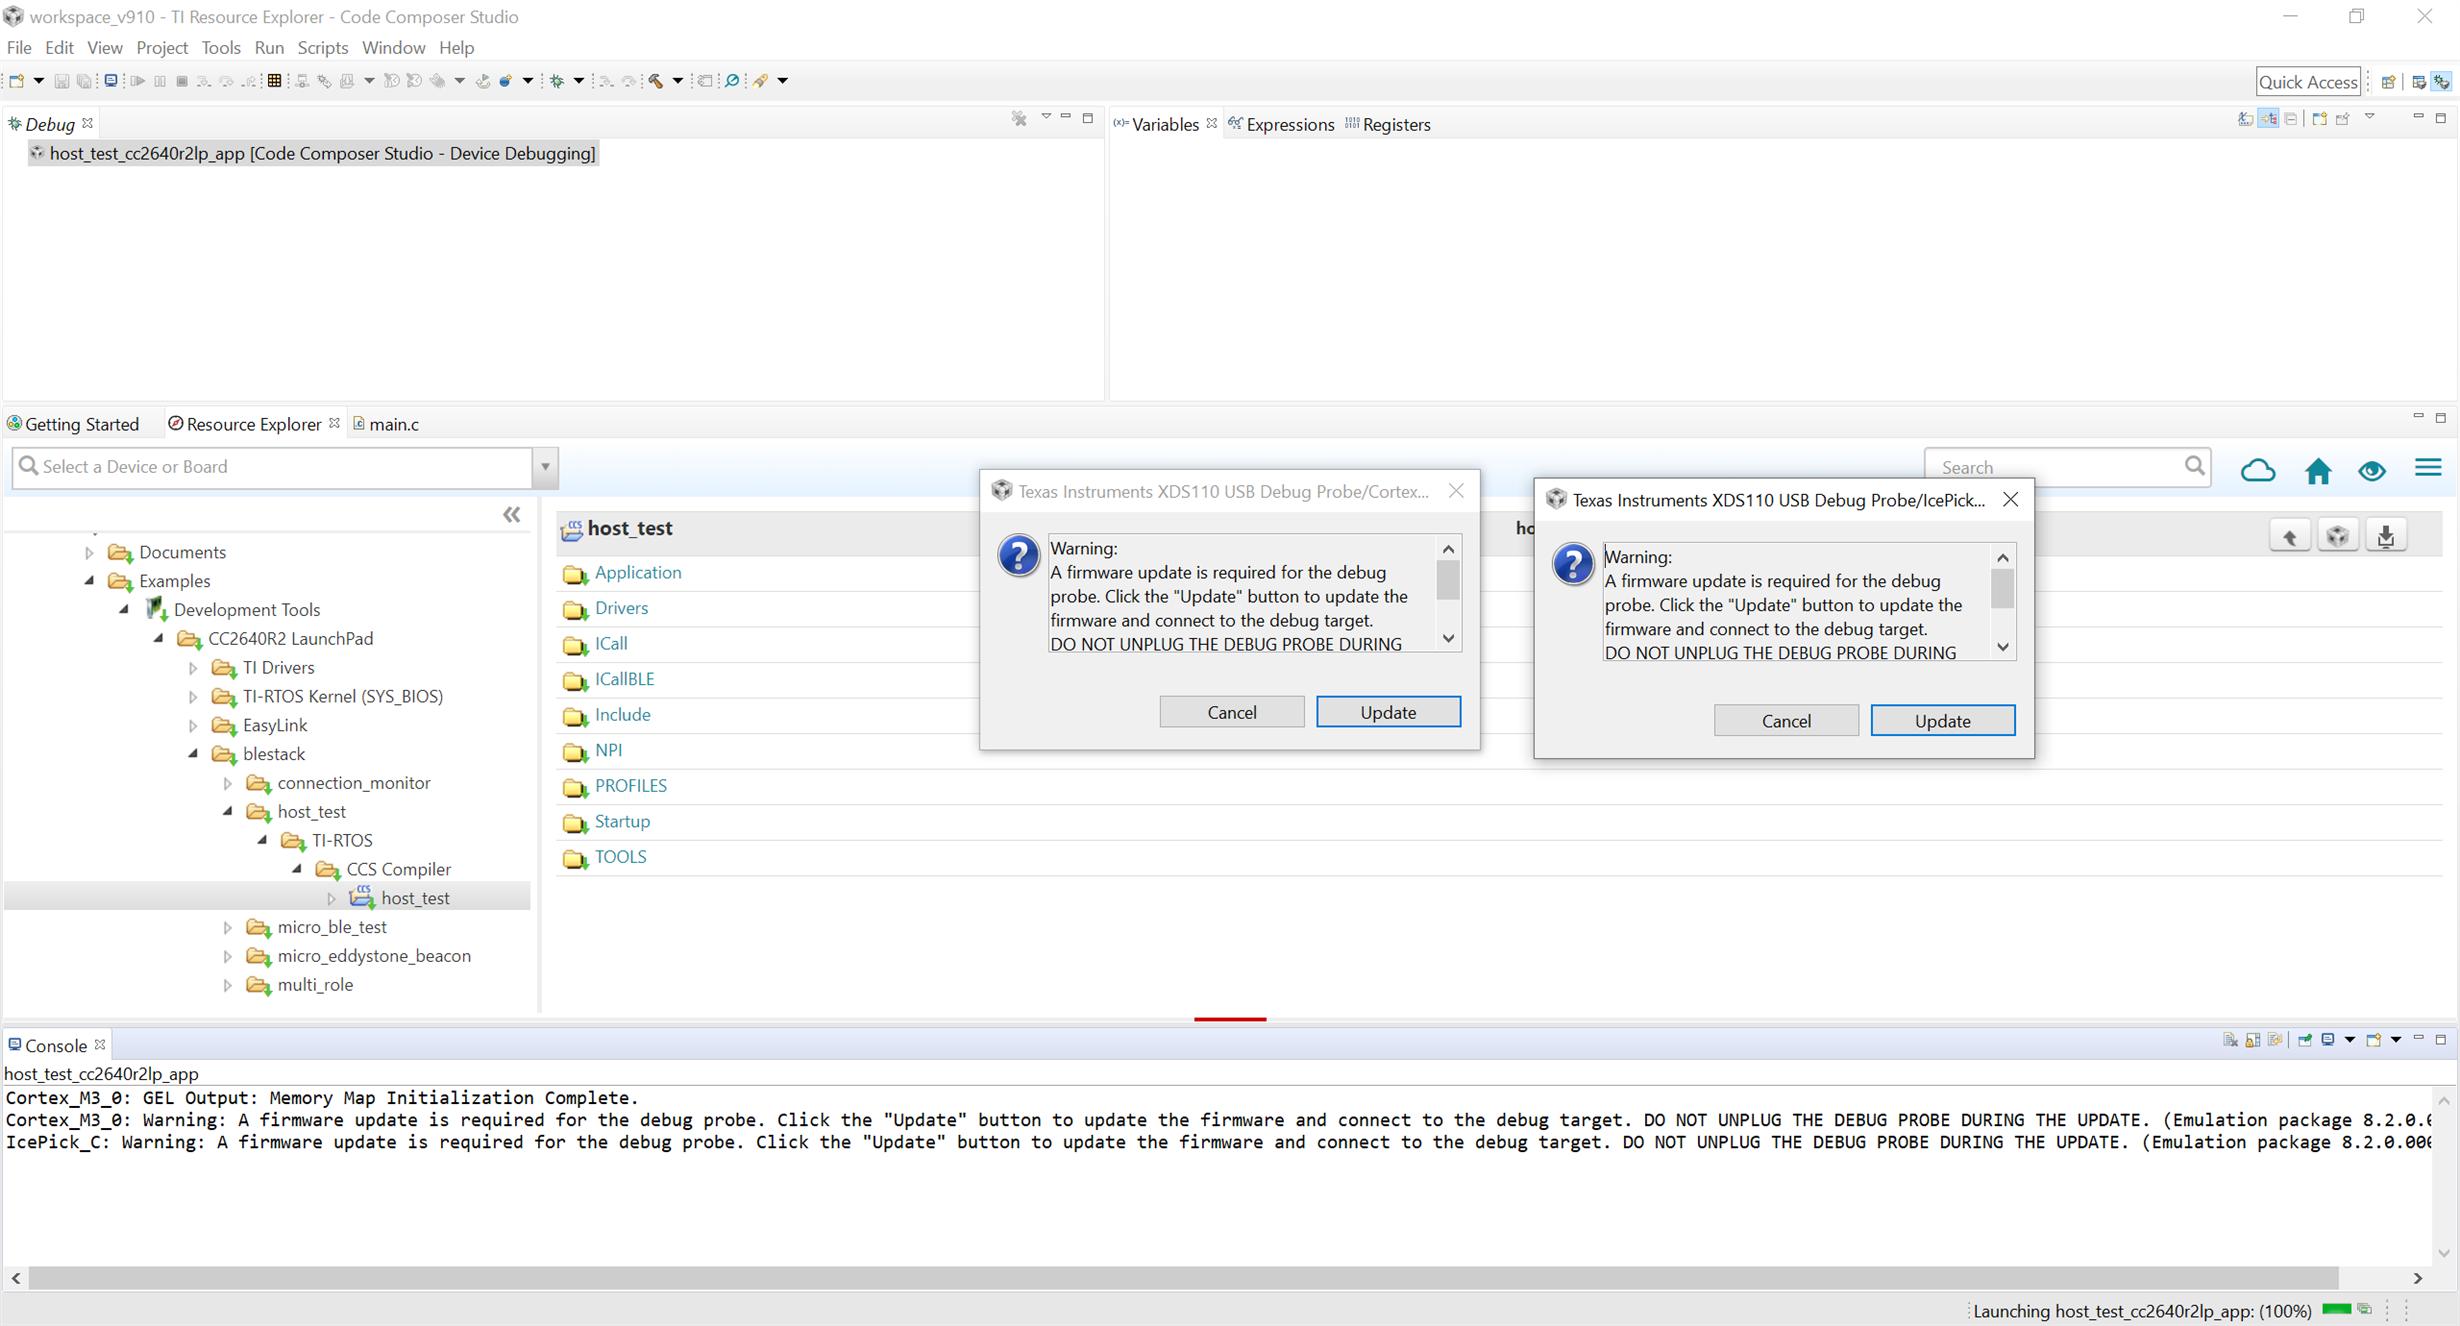 CCS/LAUNCHXL-CC2640R2: Update XDS100 firmware then Load program